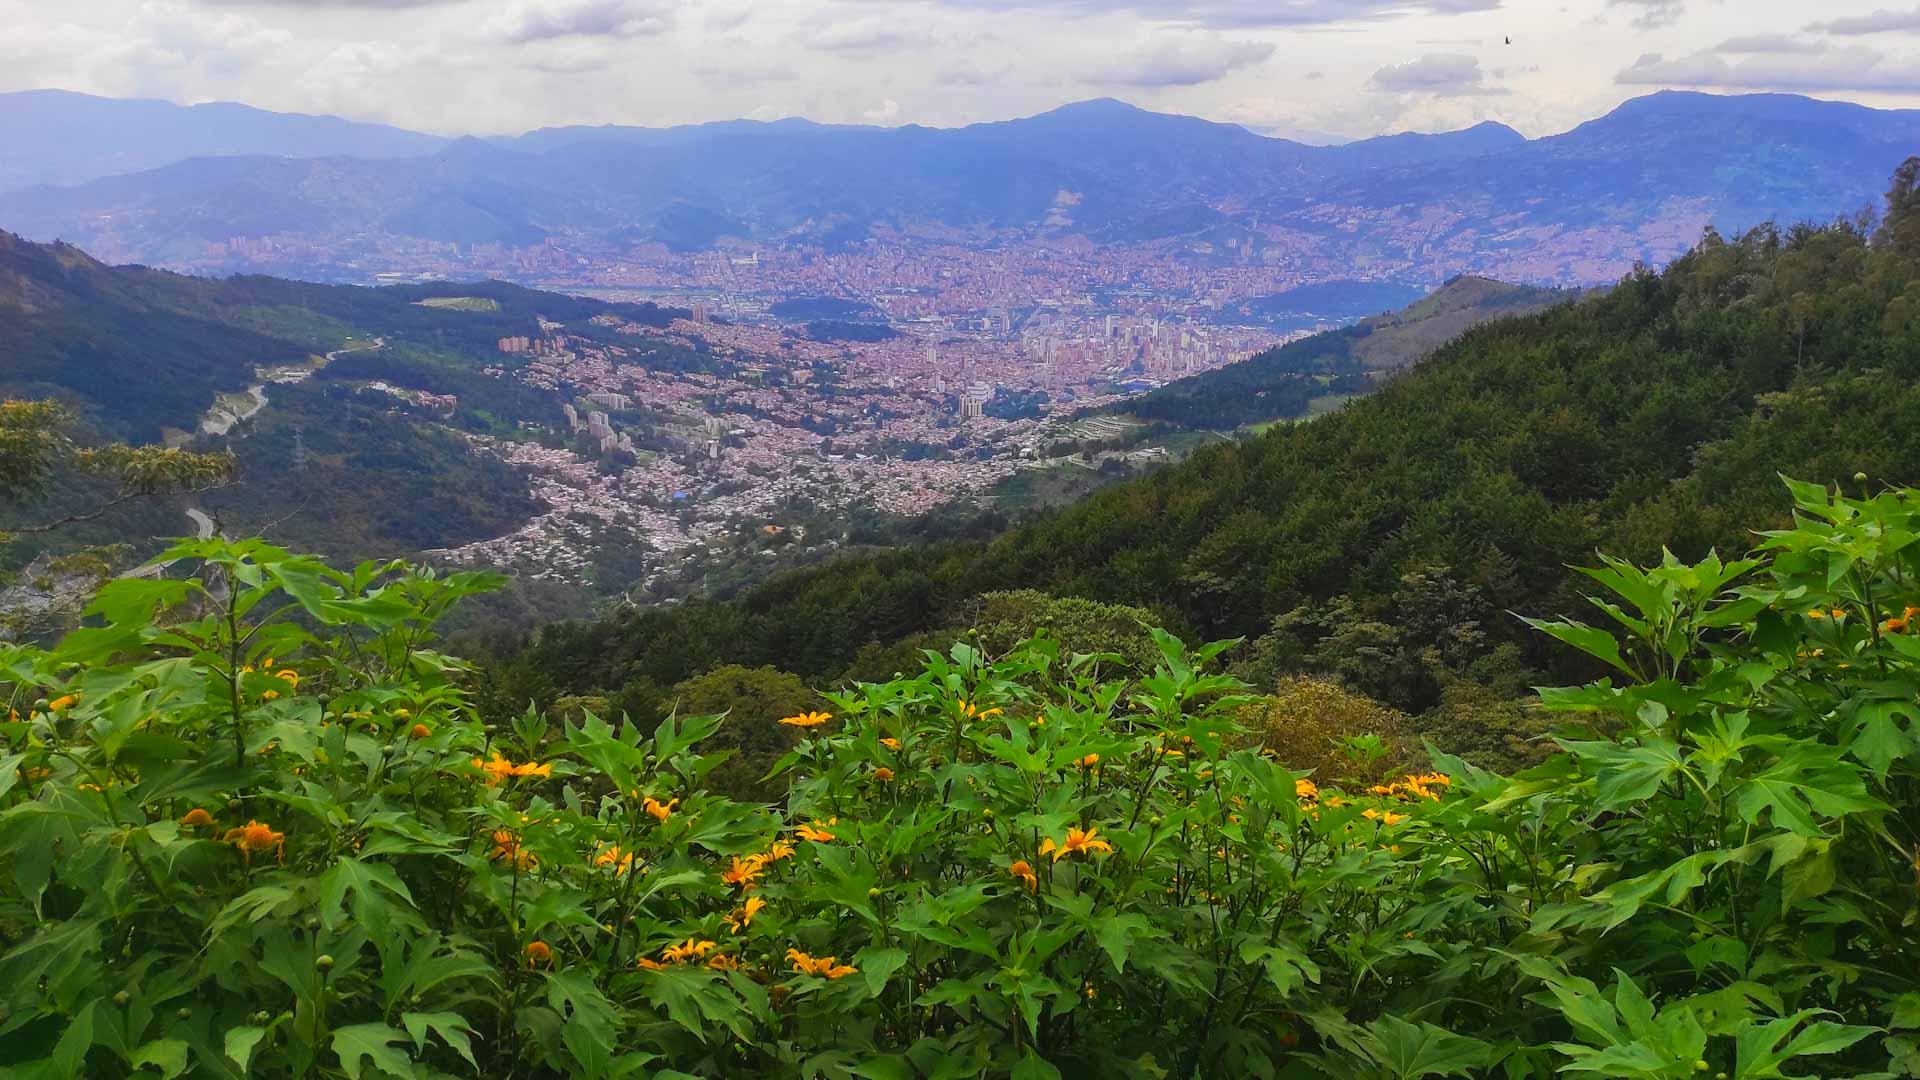 kolumbien-sehenswuerdigkeiten-stadt-medellin